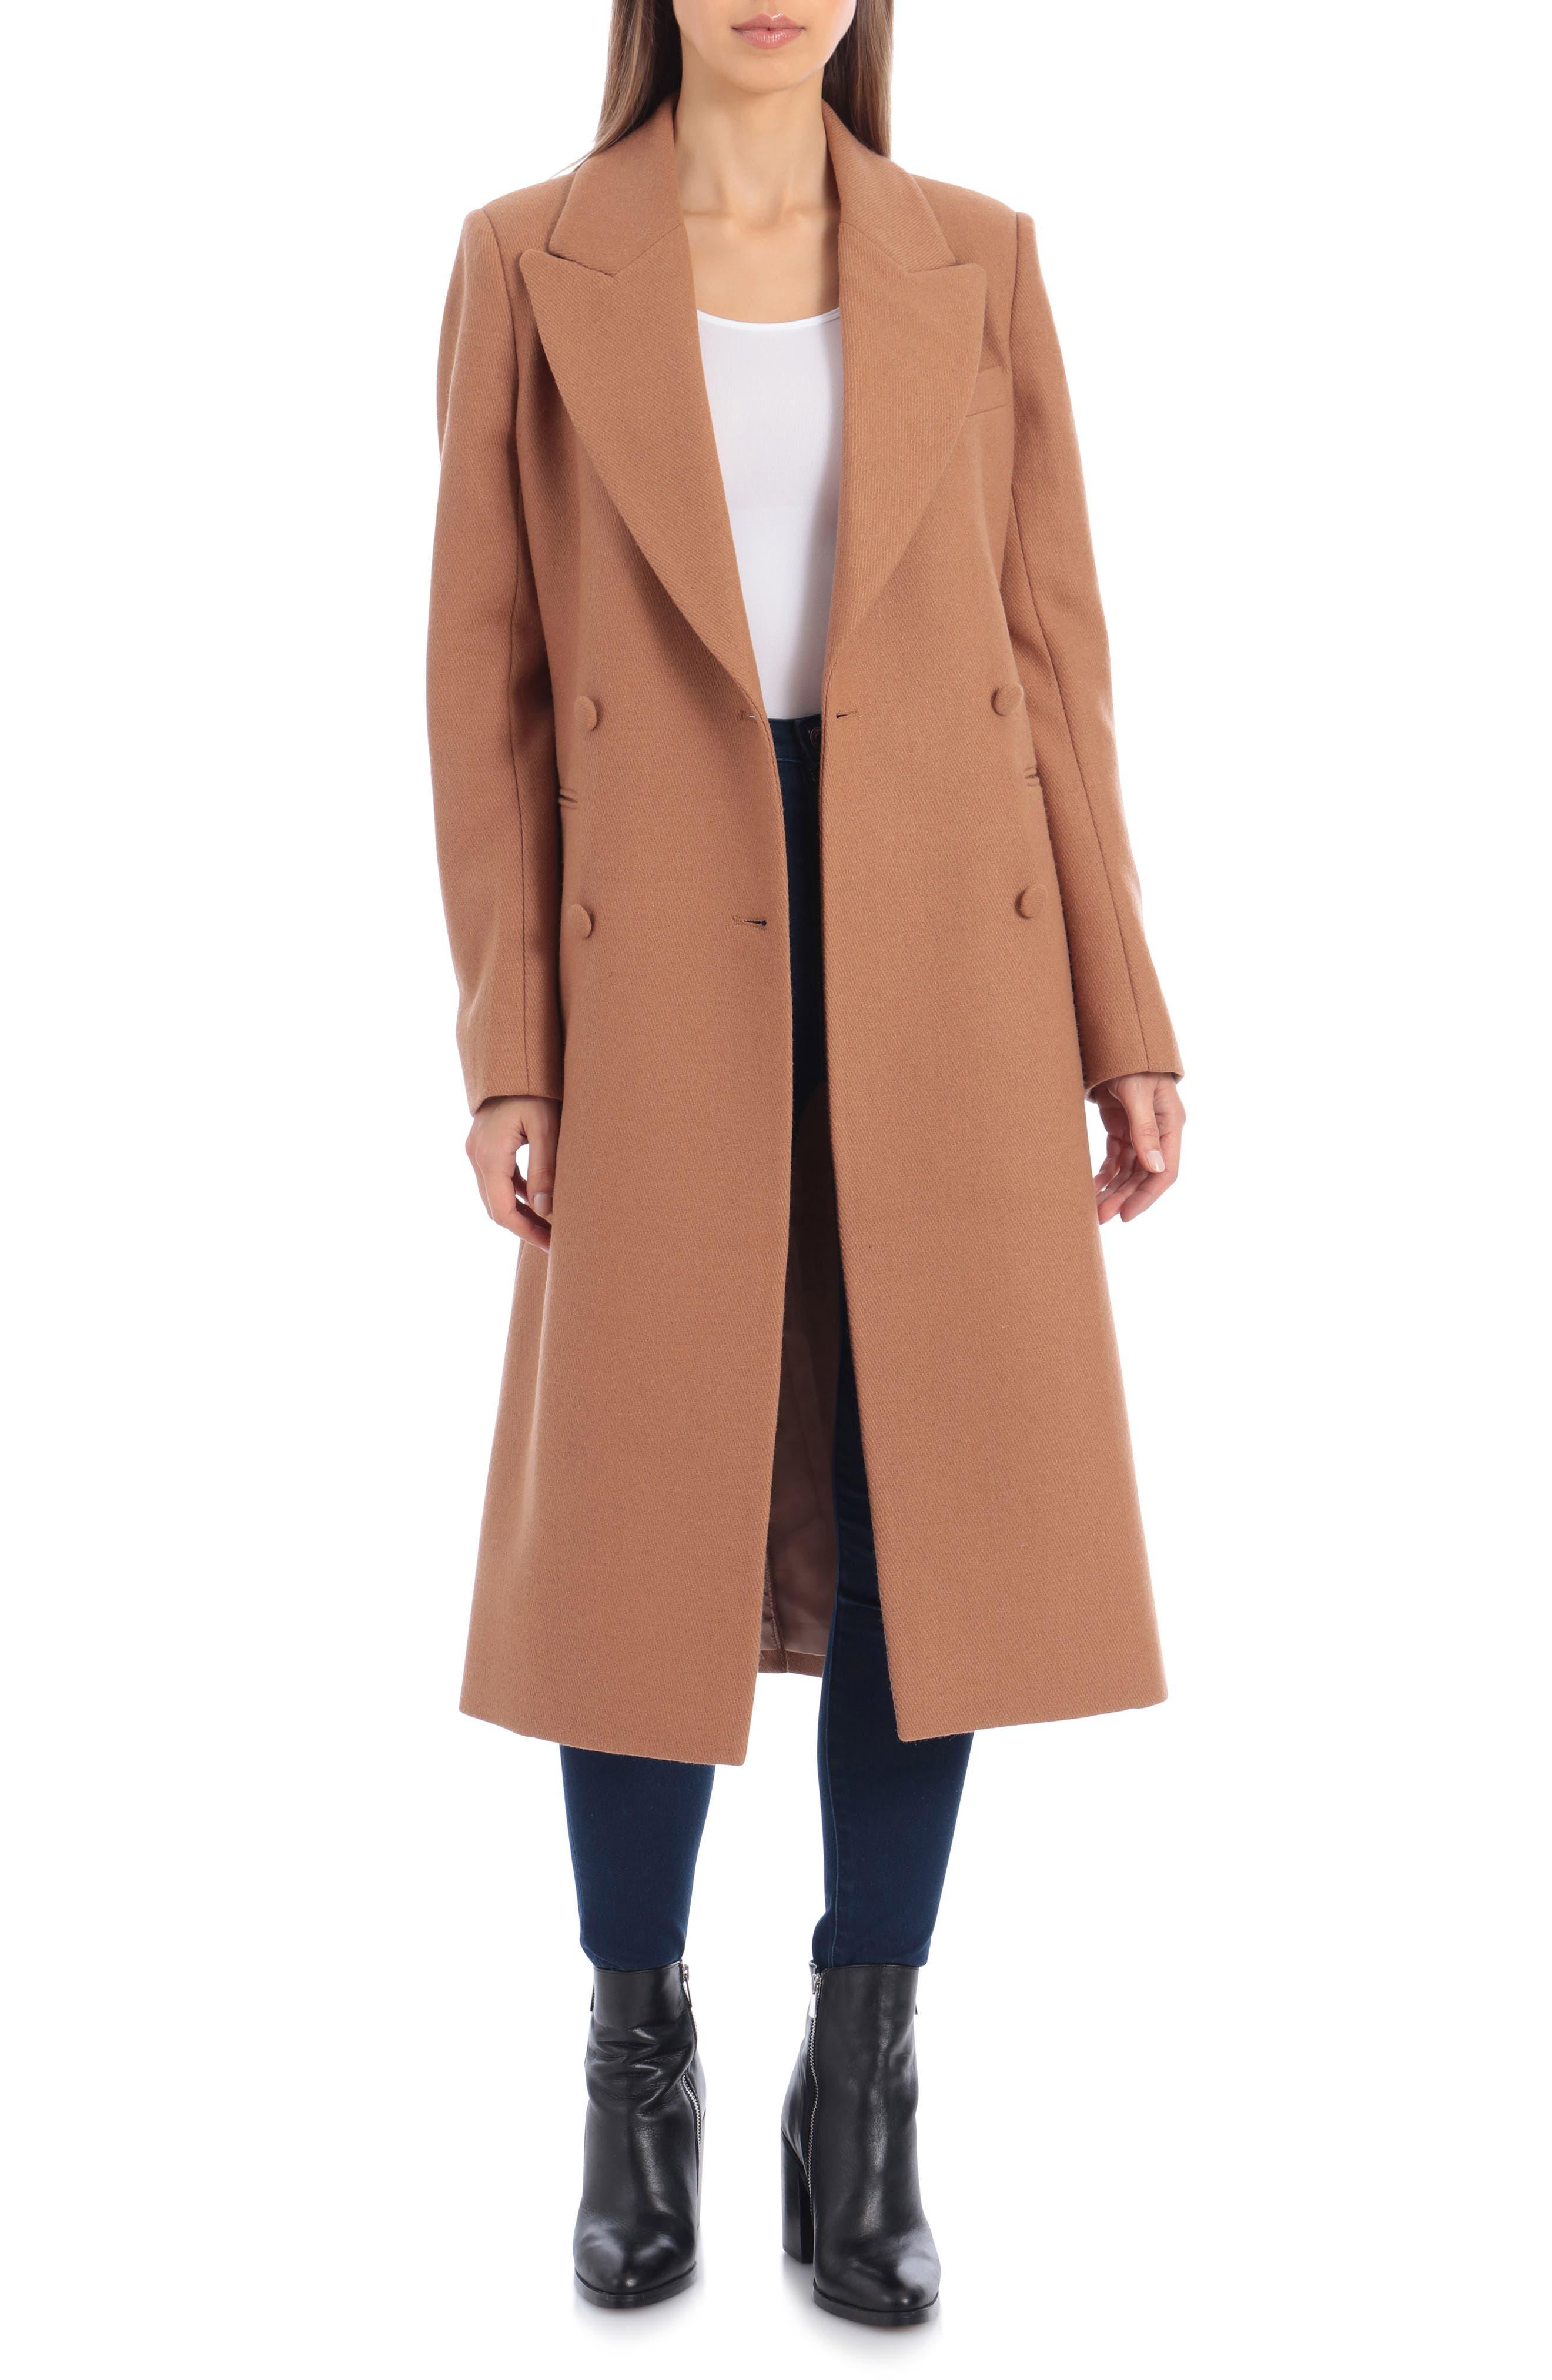 Vintage Coats & Jackets | Retro Coats and Jackets Womens Avec Les Filles Double Breasted Wool Blend Coat $199.90 AT vintagedancer.com